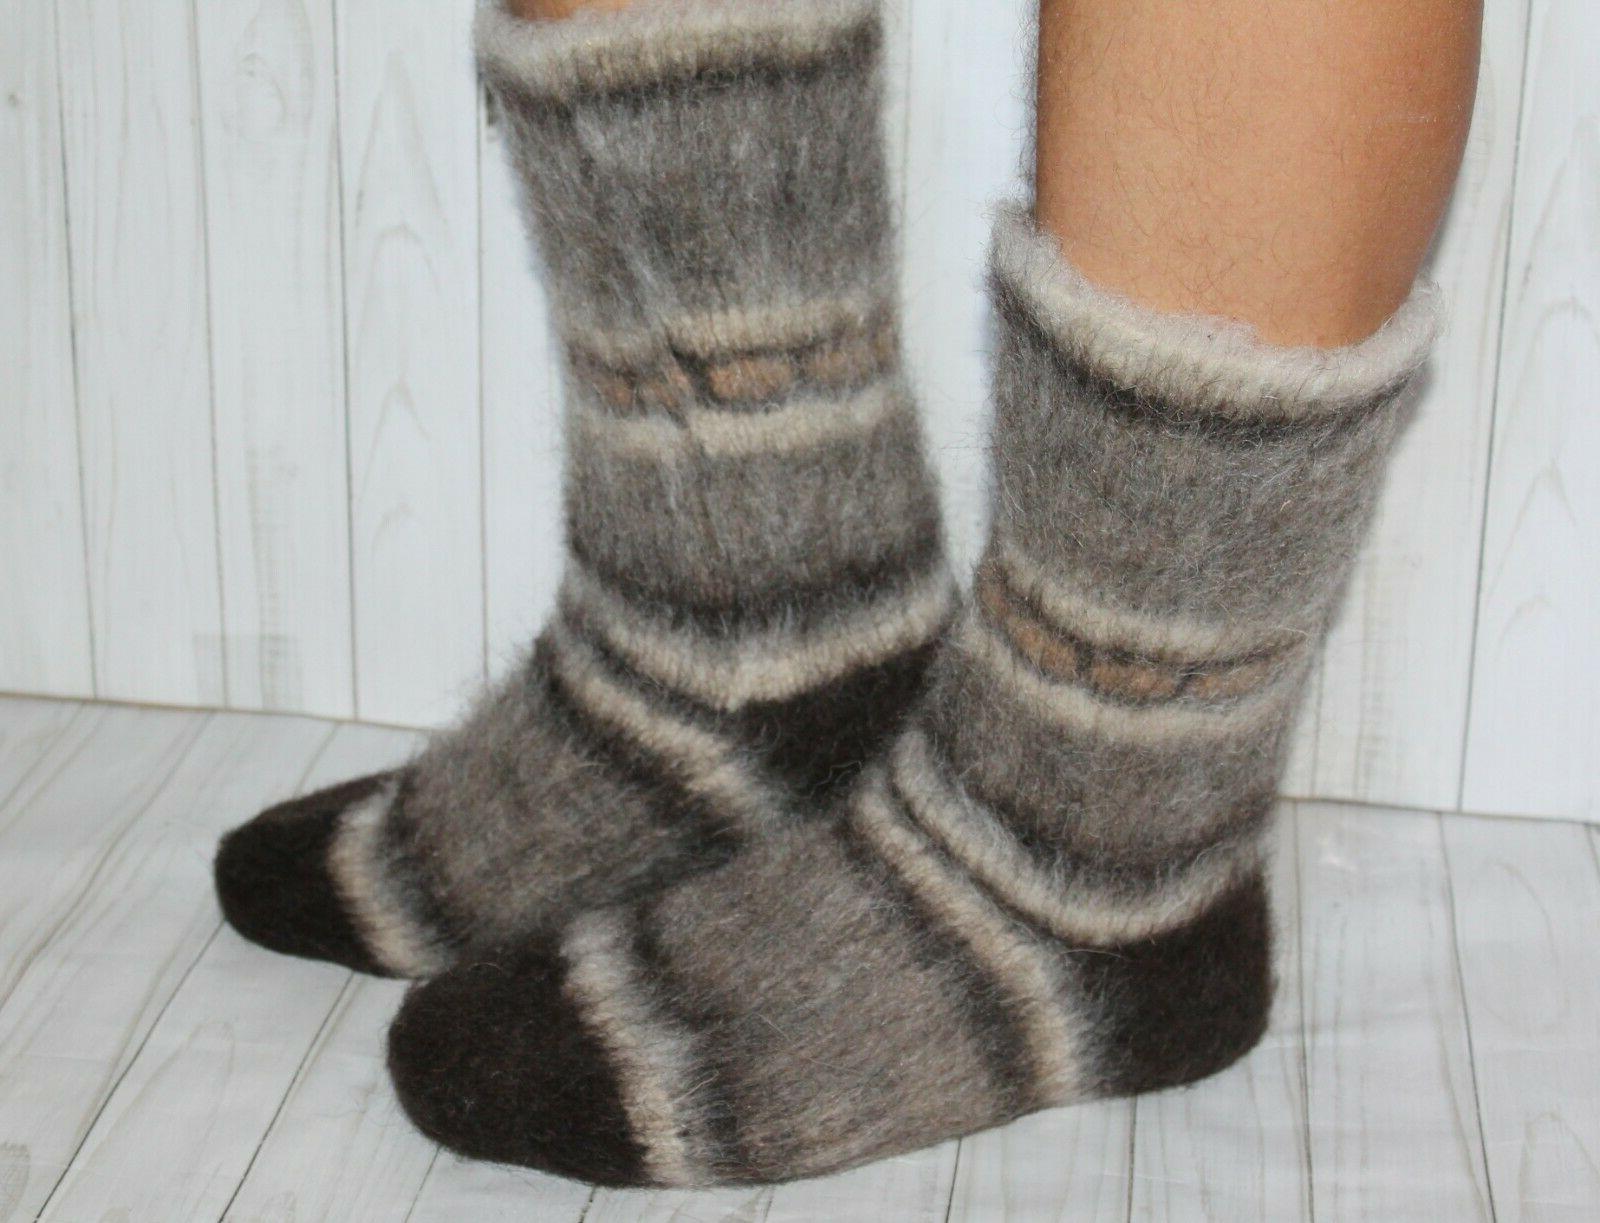 MEN's  SOCKS SUPER THICK 100% SHEEP WOOL merino warm heavy s